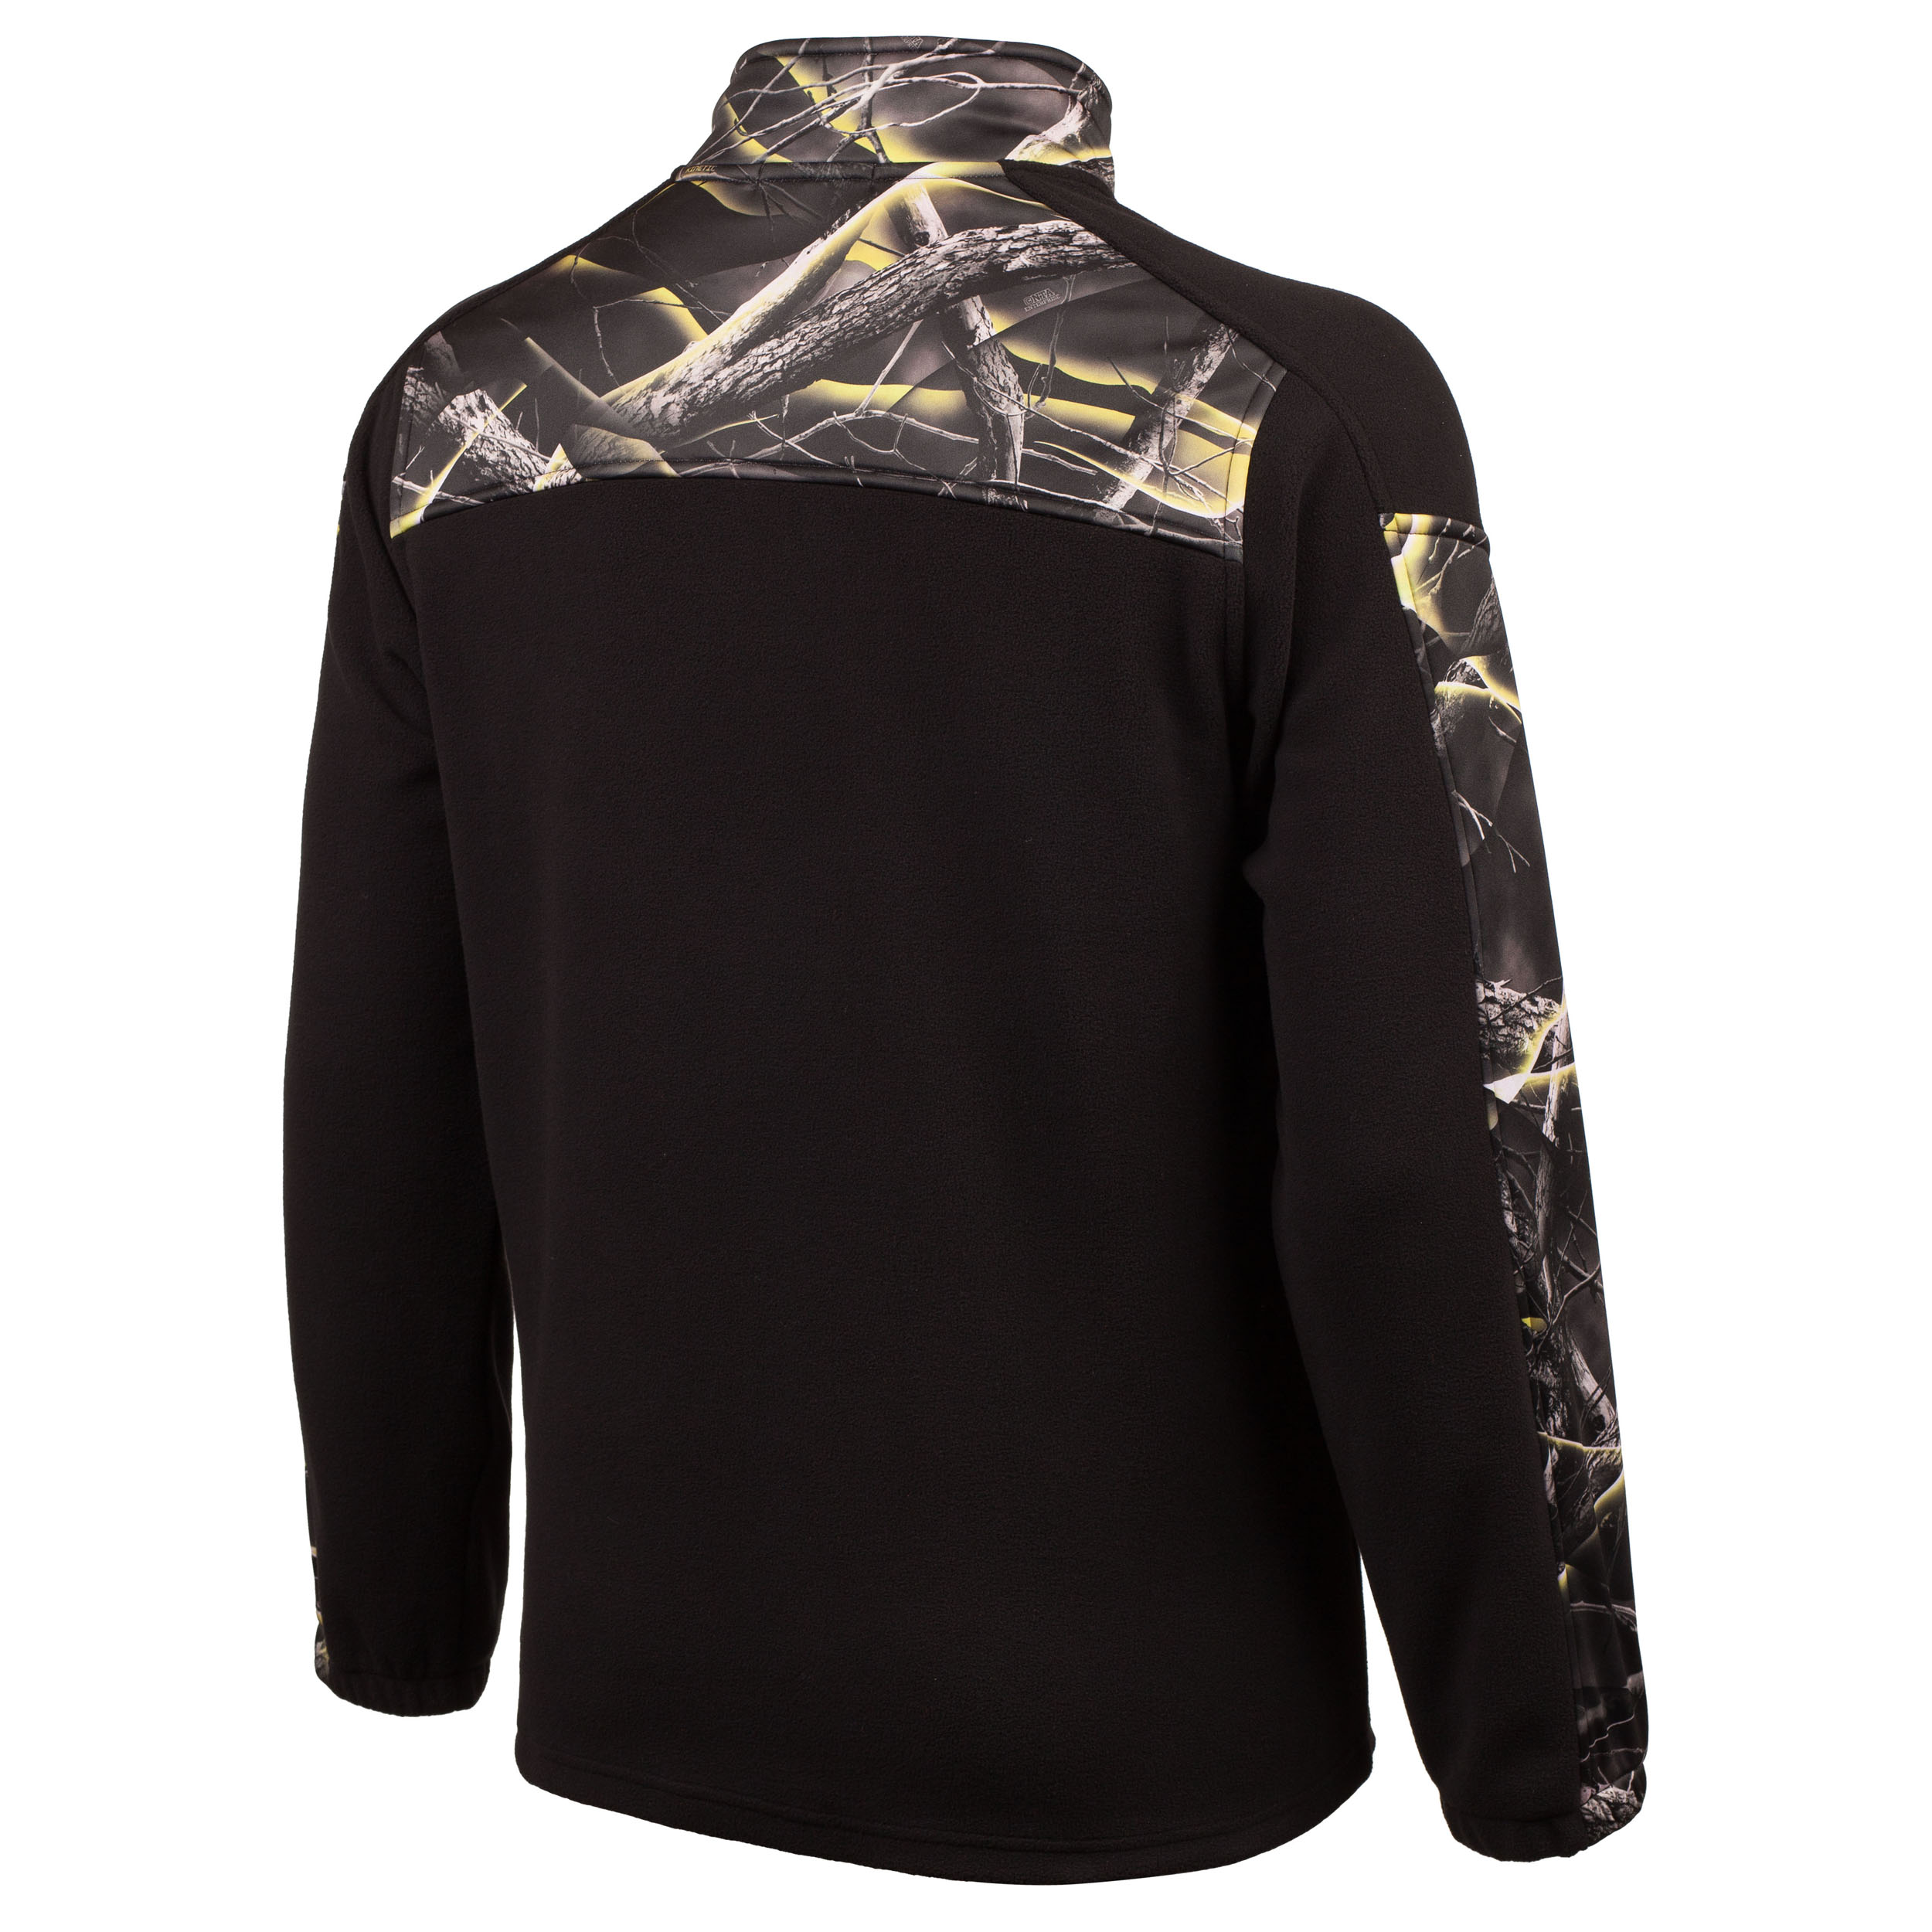 Not So Much Fleece Pullover Hooded Sweatshirt With Kangaroo Pocket Men/â/€s Goats Make Me Happy You